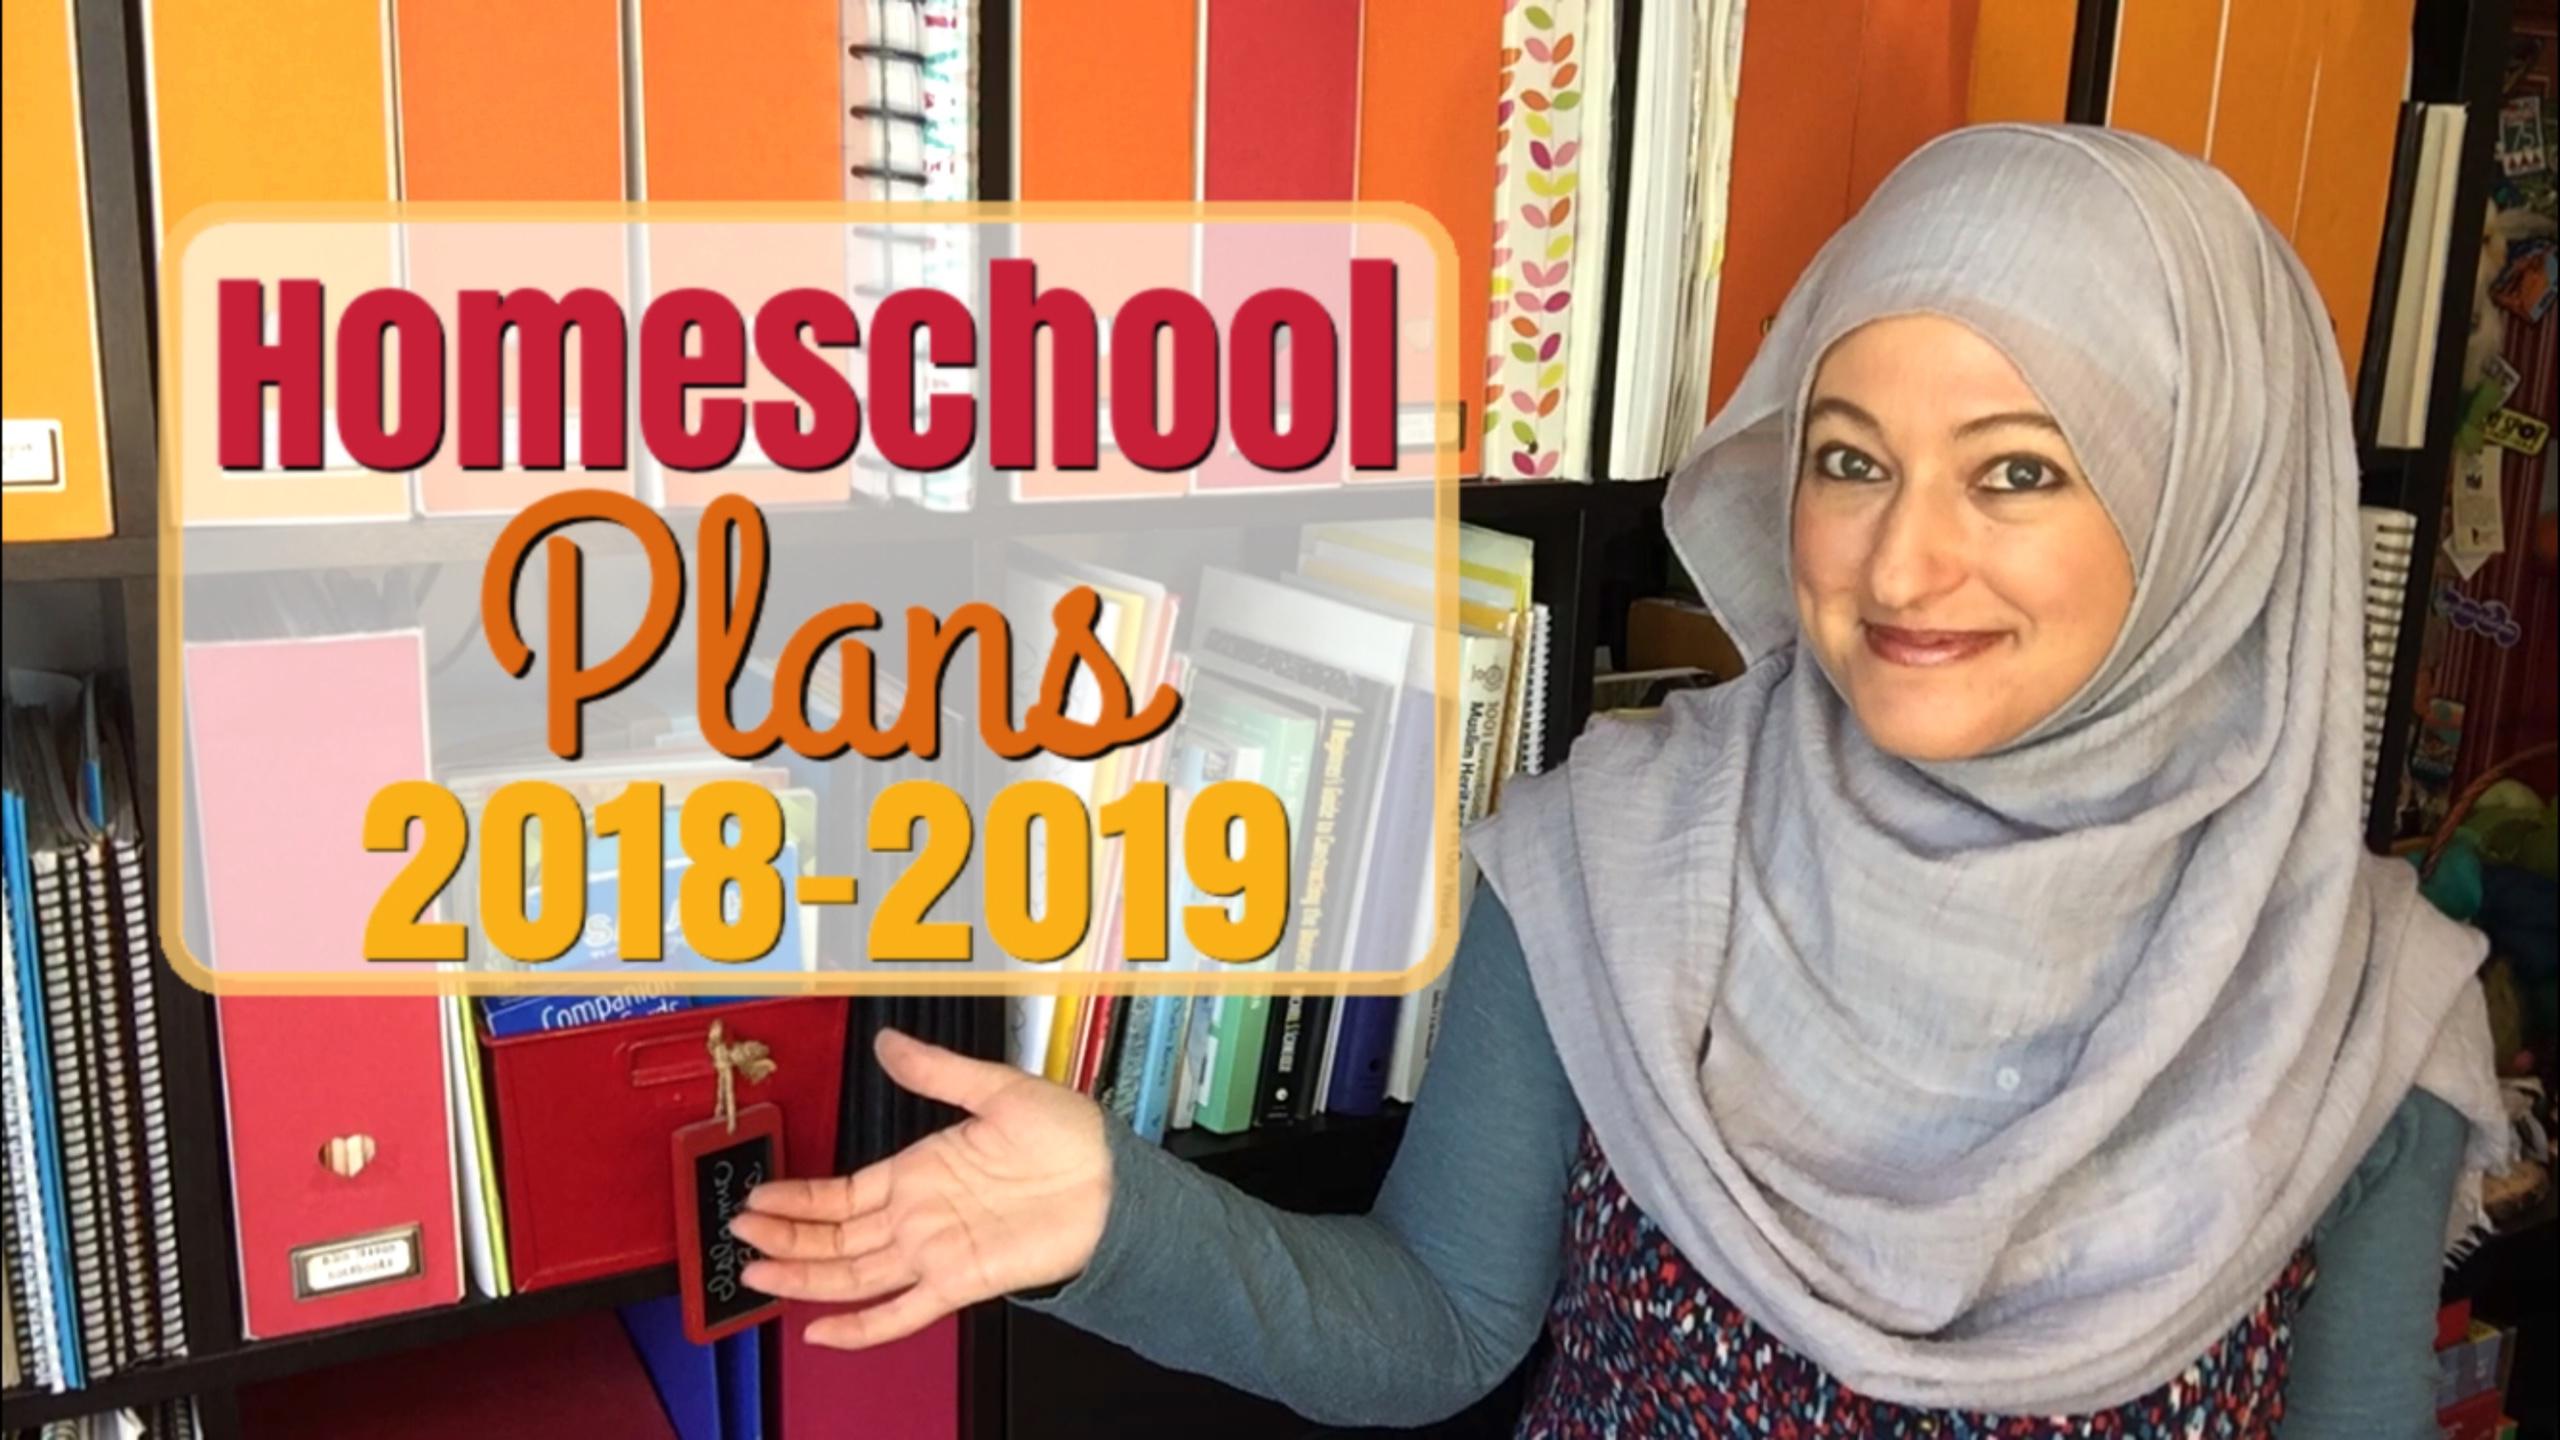 HOMESCHOOL PLANS FOR 2018-2019